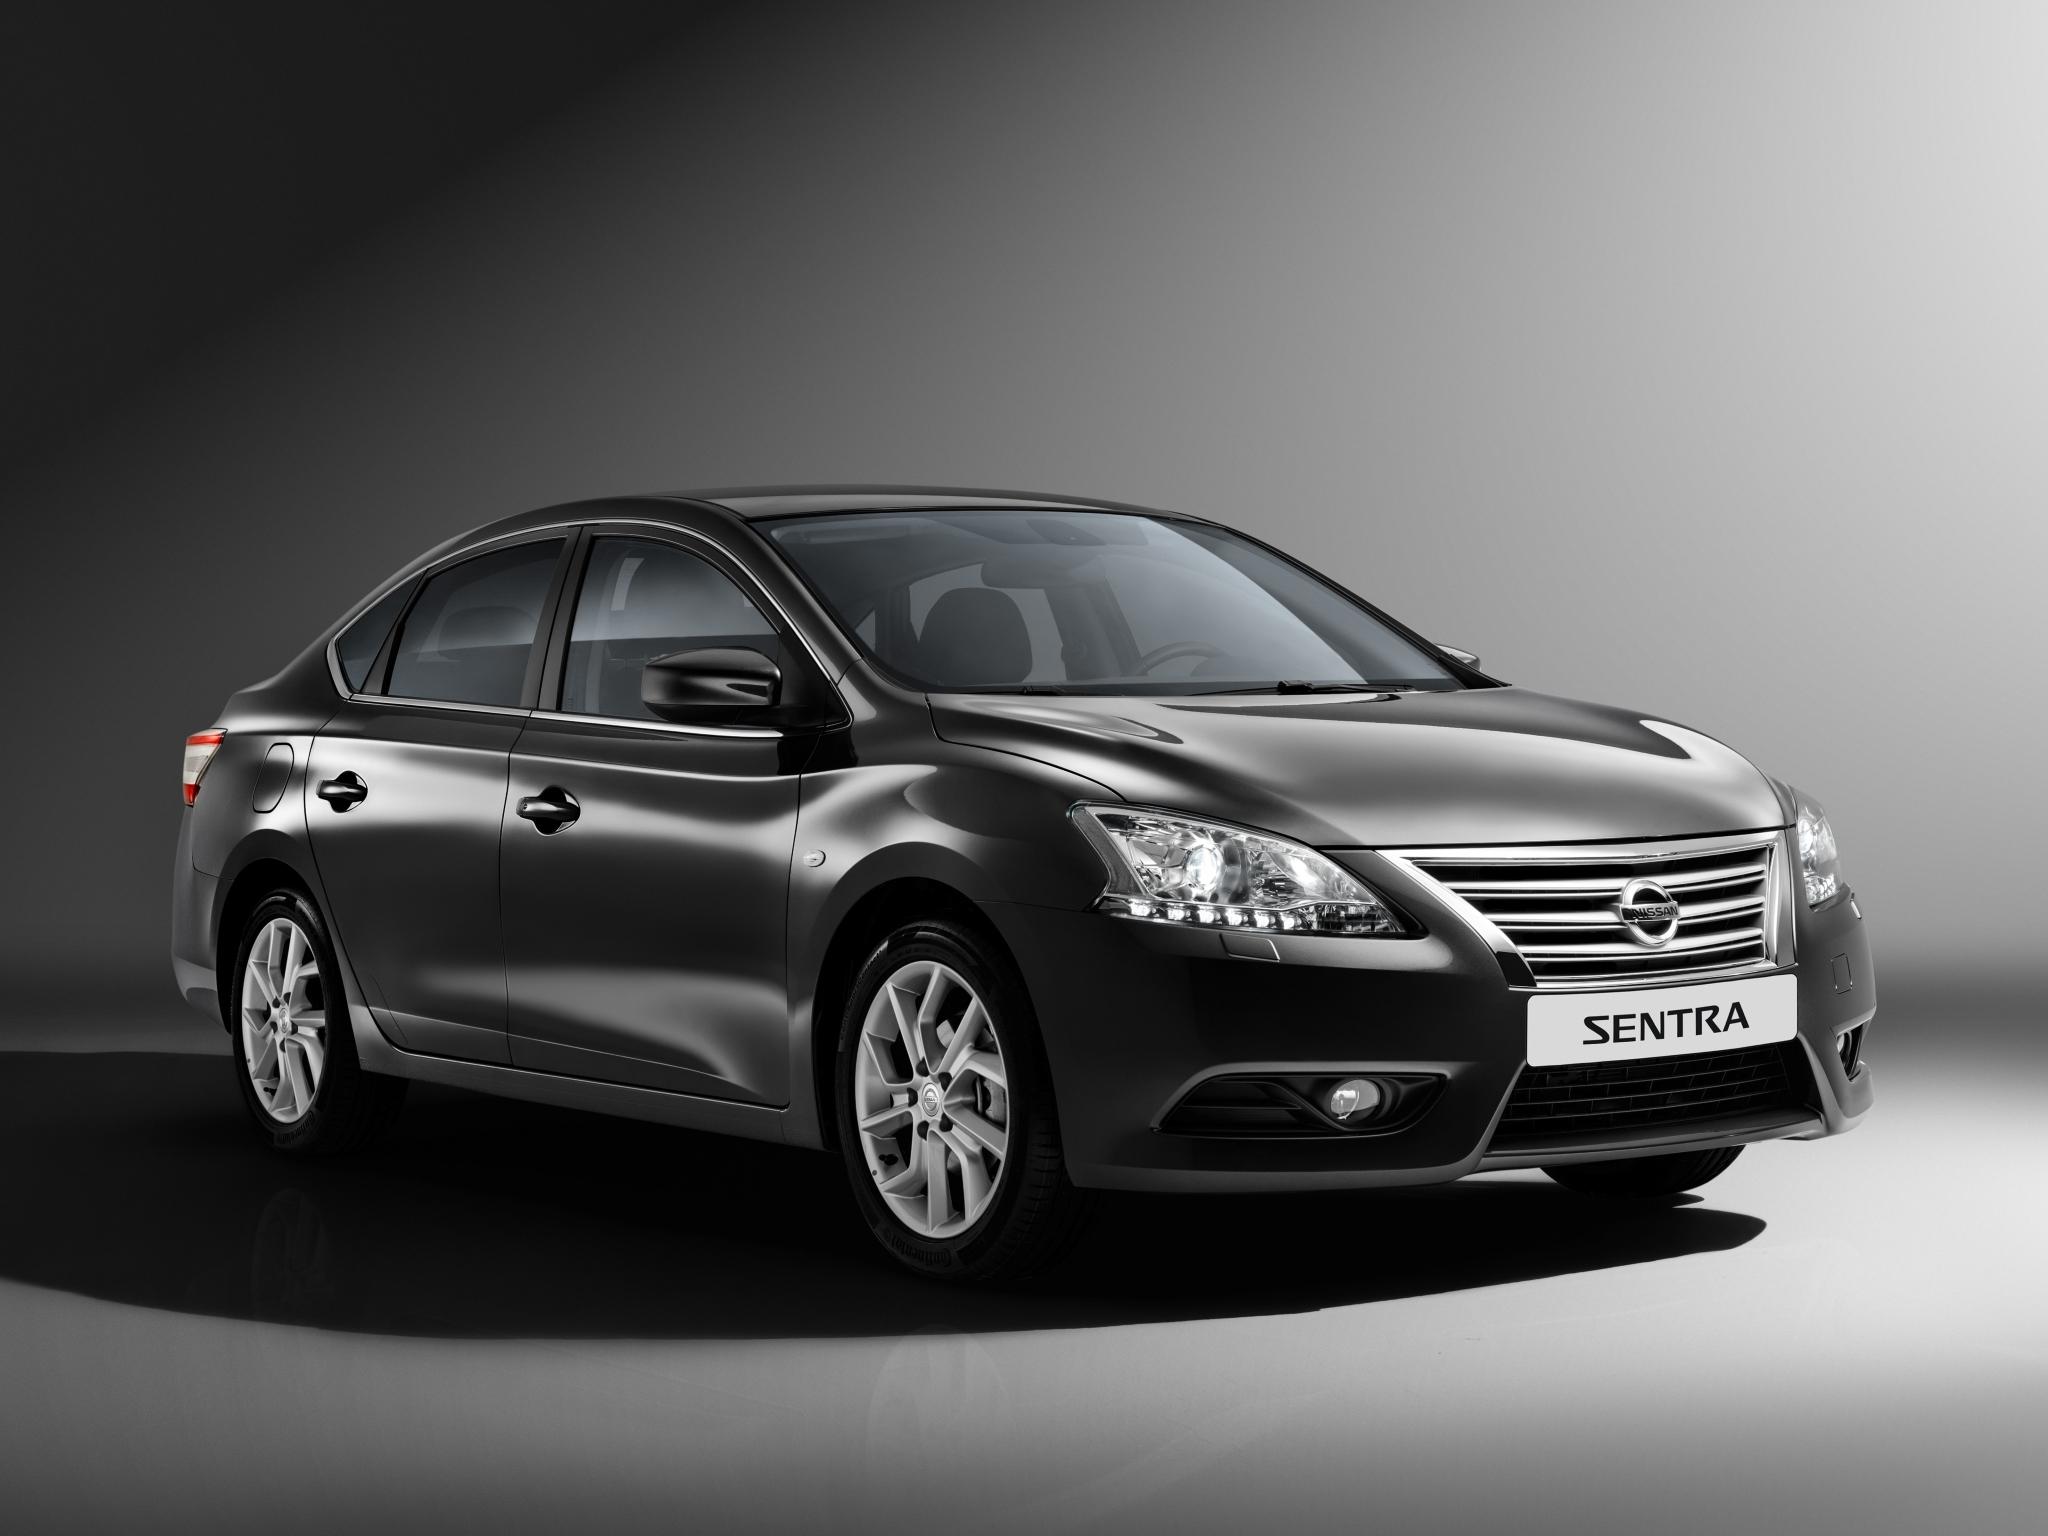 Russian-Spec Nissan Sentra Sedan Revealed in Moscow ...